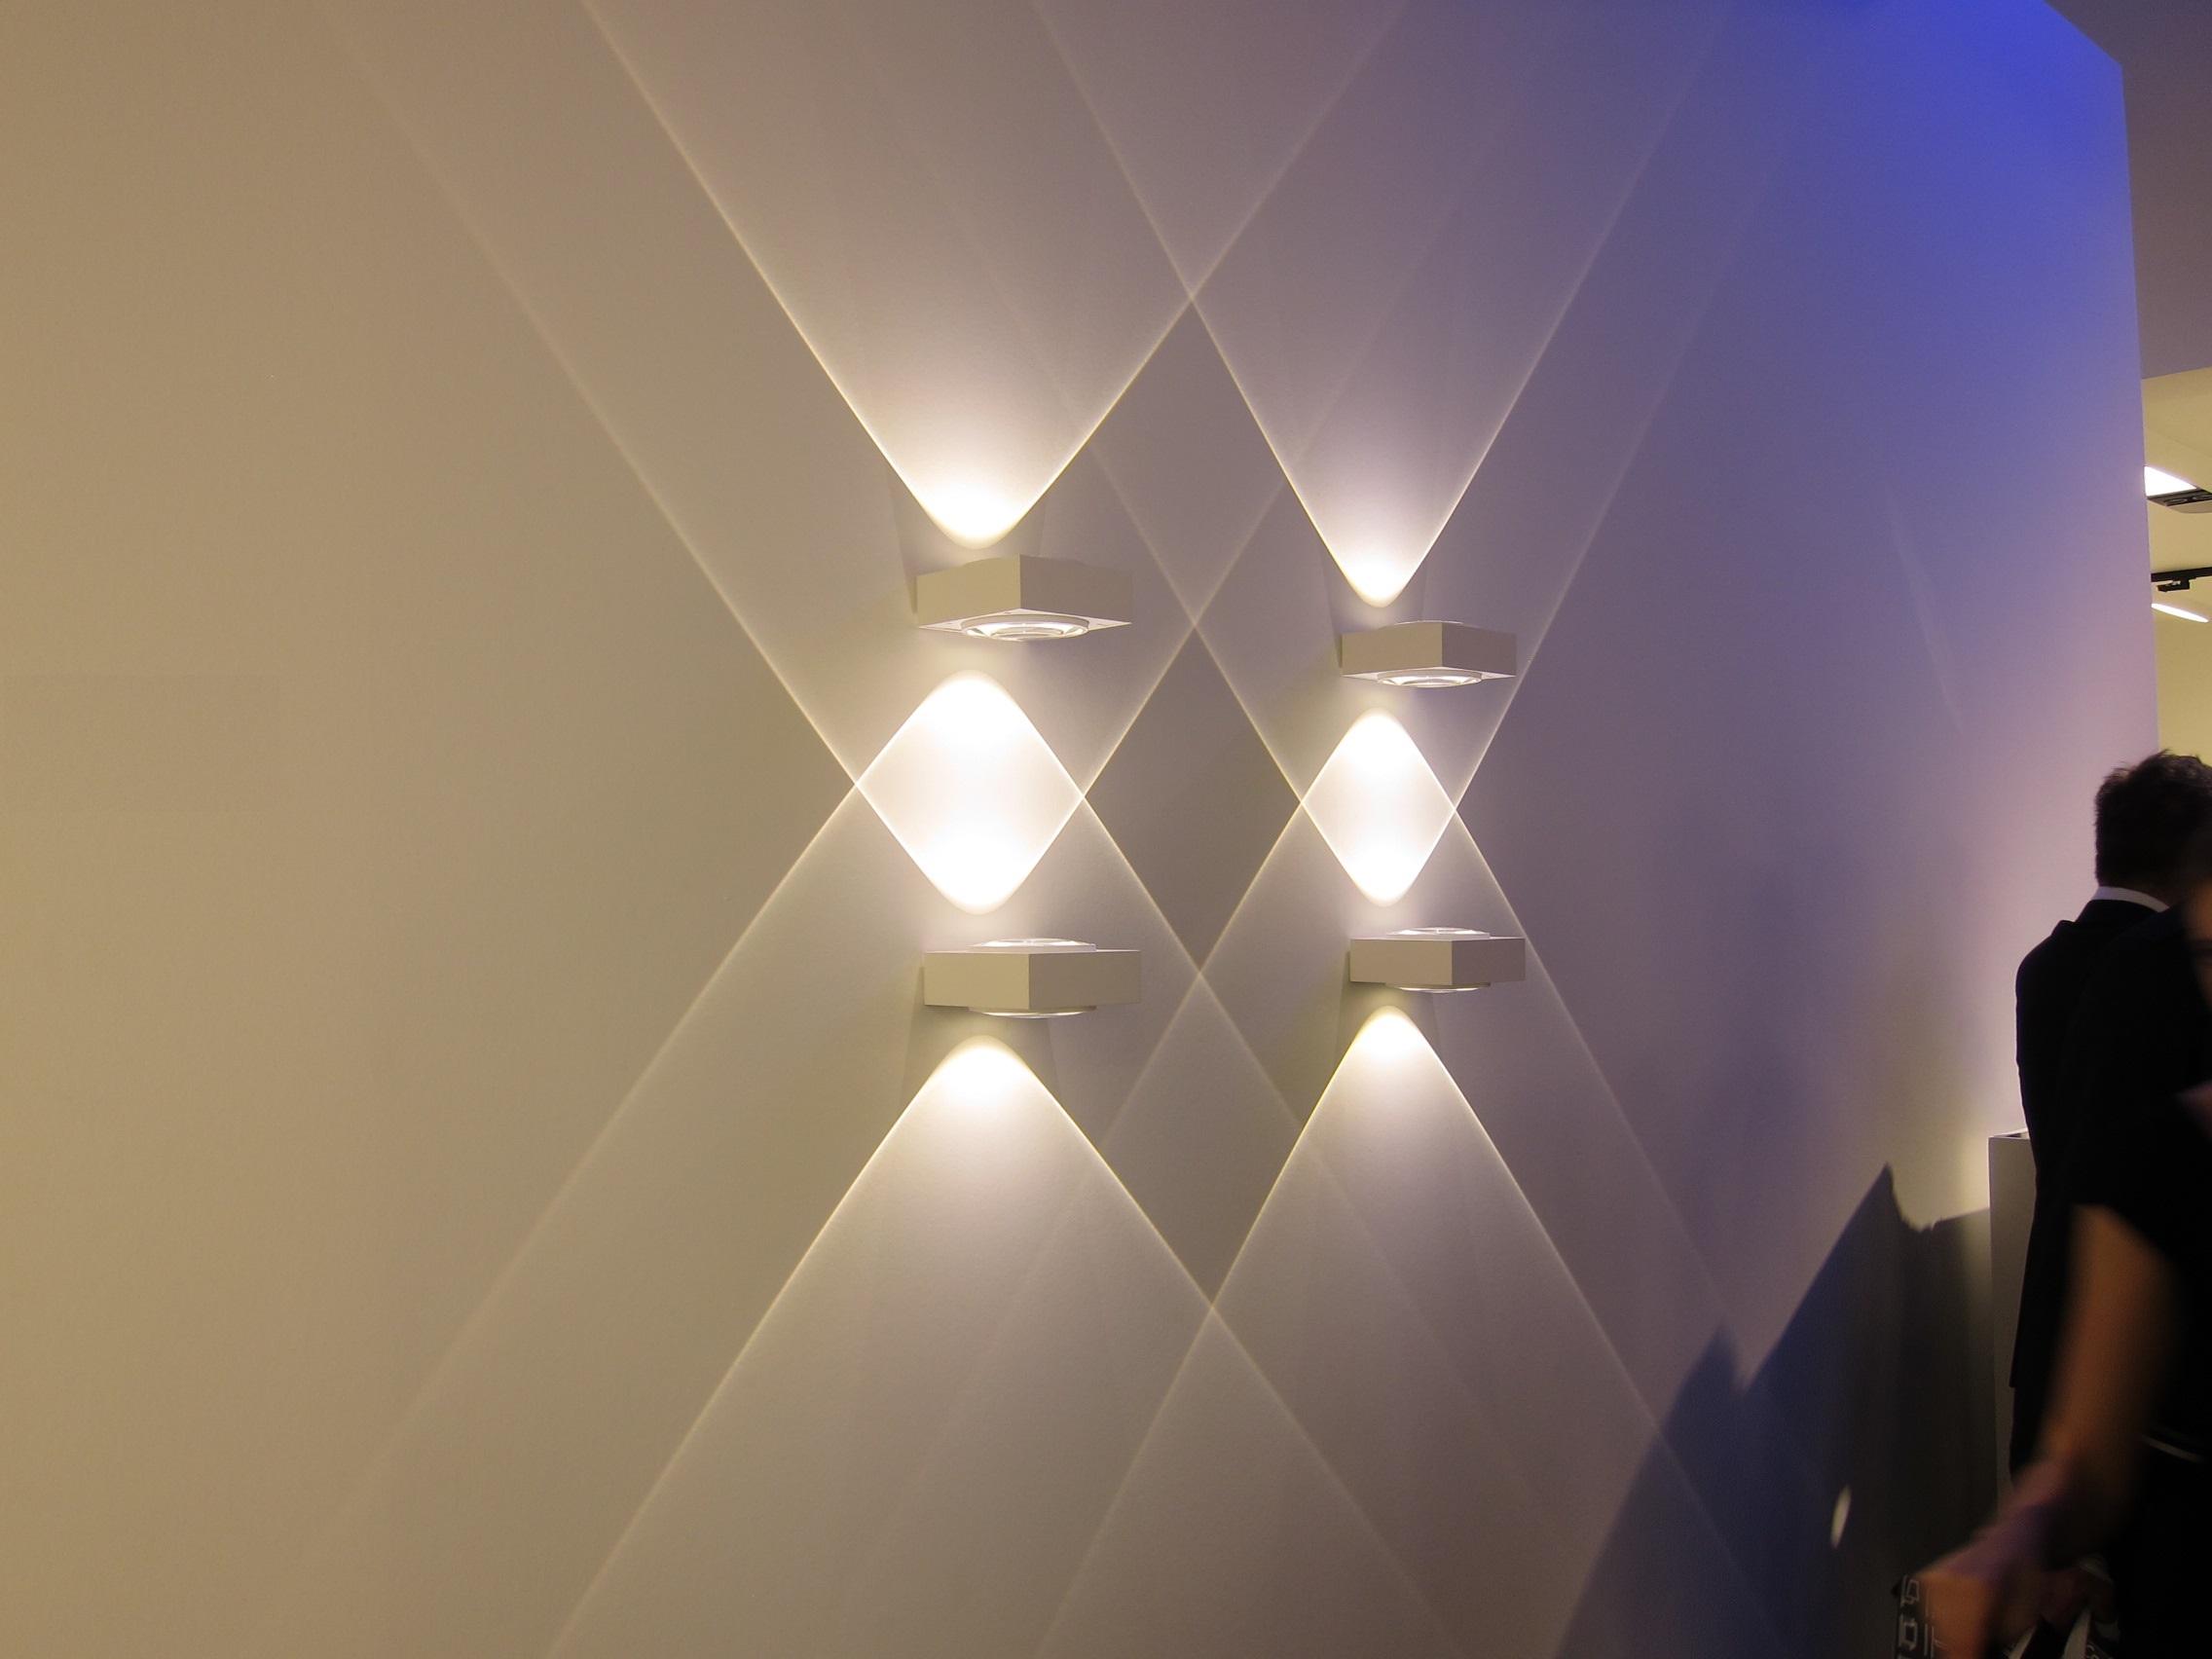 super popular 40d49 0b0b5 Ceiling Wall Light Sets